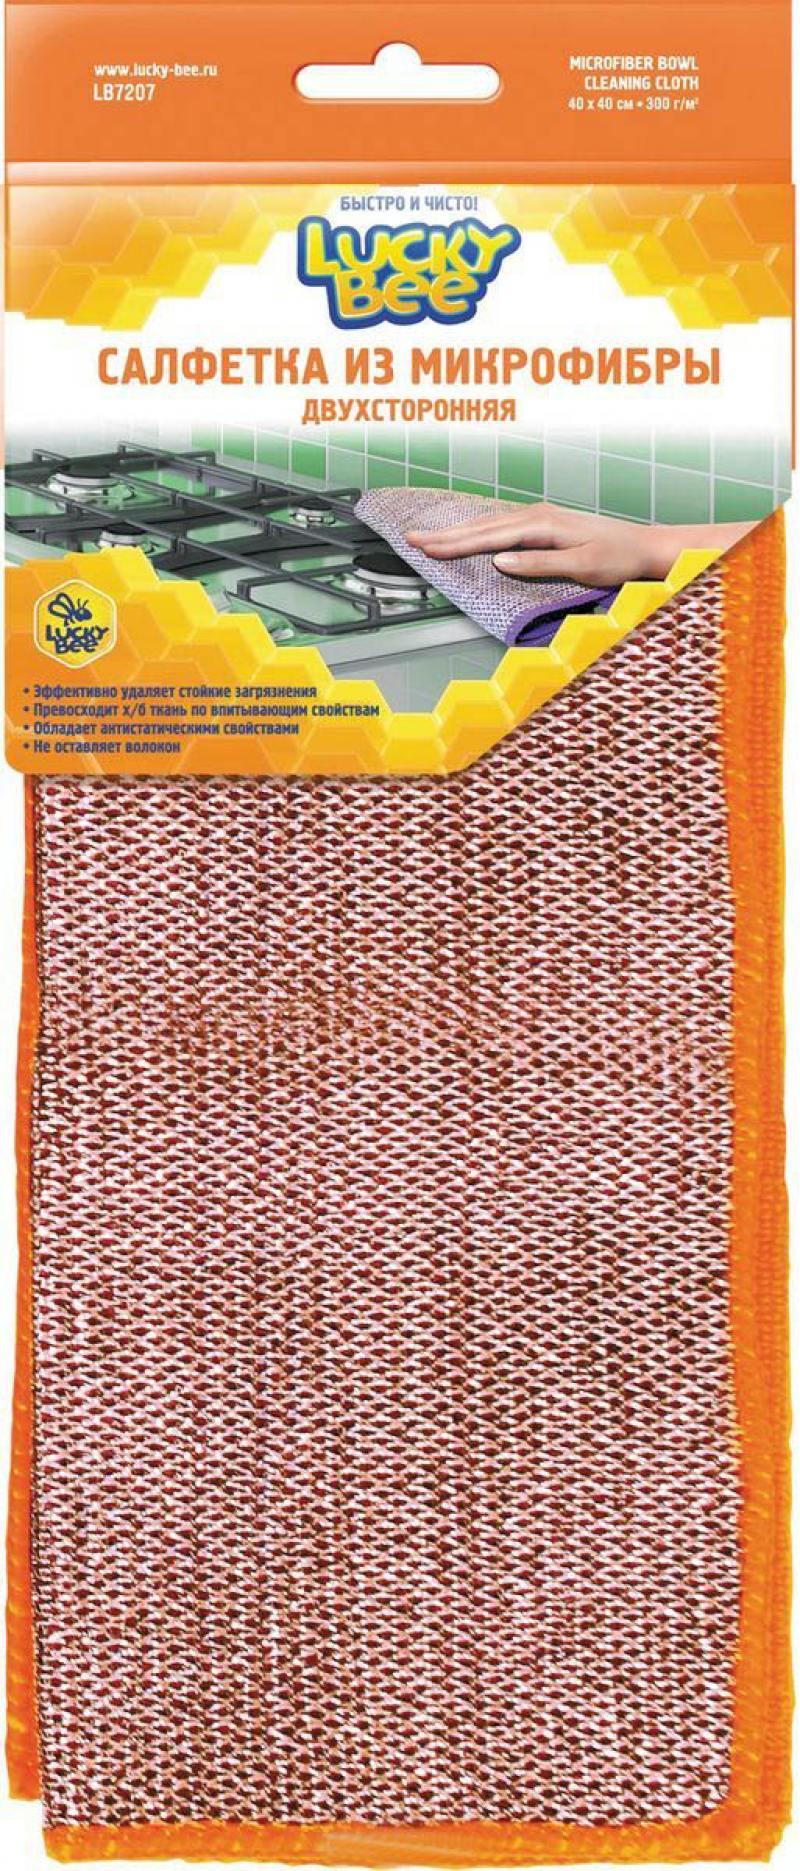 Салфетки из микрофибры двухсторонние 40х40 Lucky Bee LB 7207 салфетки хозяйственные lucky bee lb 7306